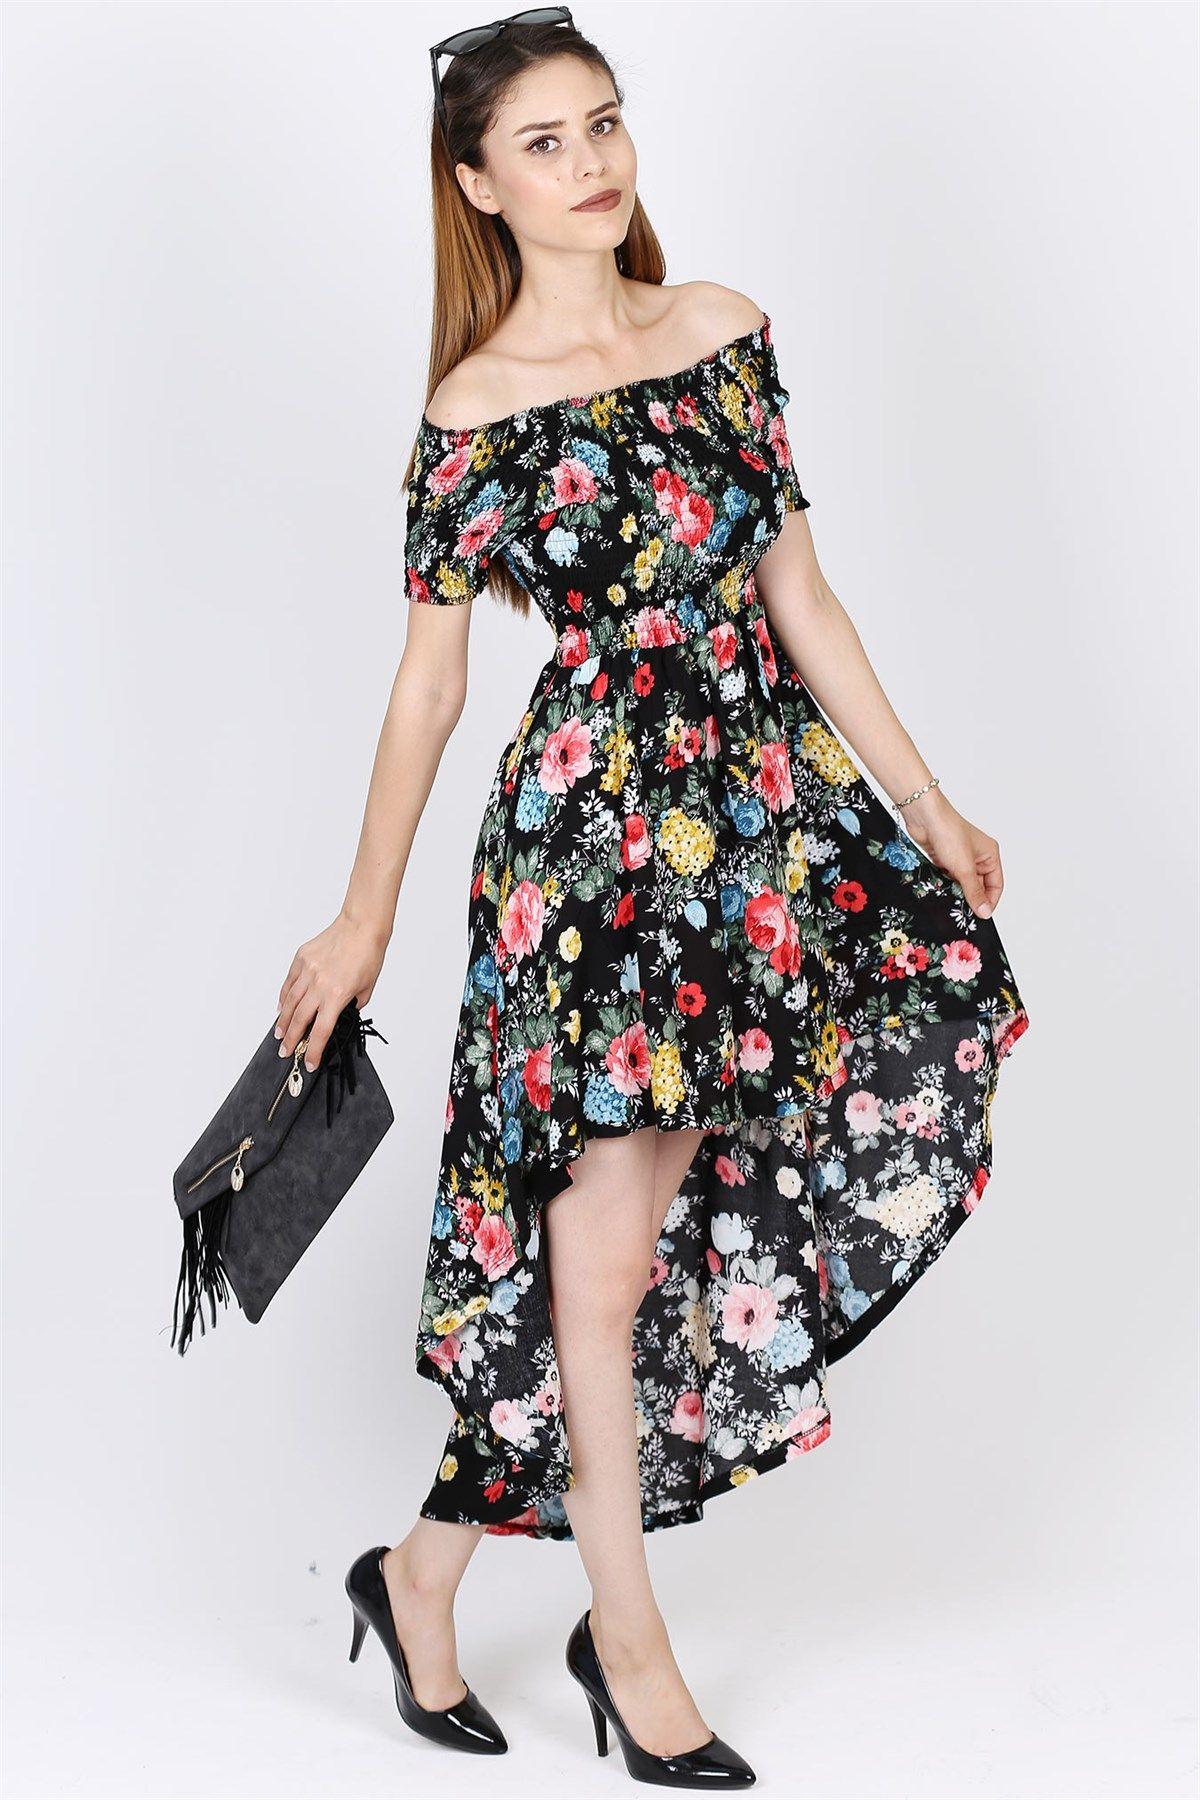 Onu Kisa Arkasi Uzun Cicek Desenli Elbise 2054b Kisa Elbise Elbise The Dress